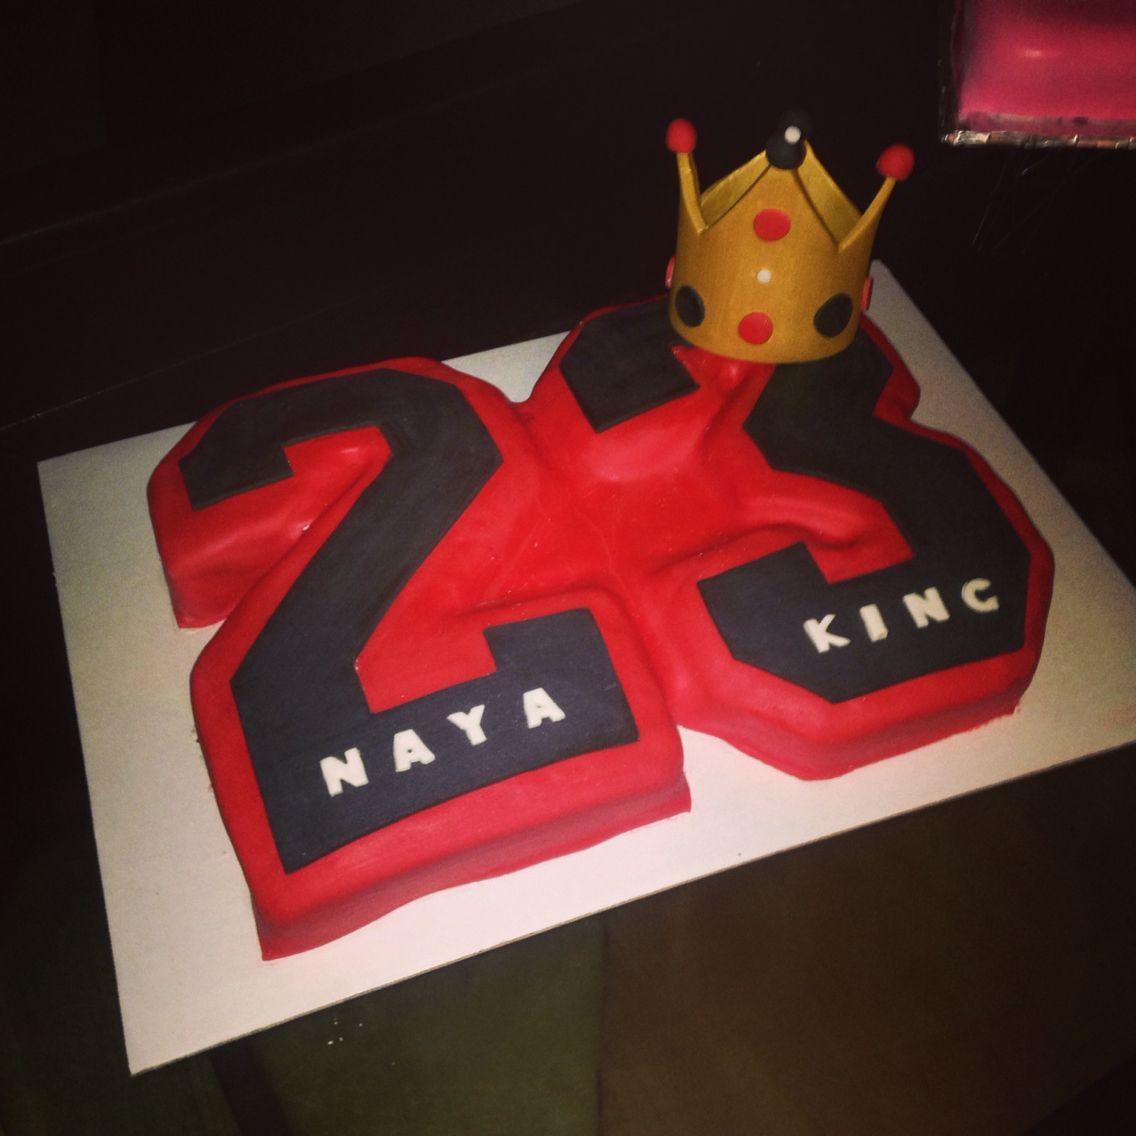 Facebook queens cakes nyc instagram monikascakes jordan